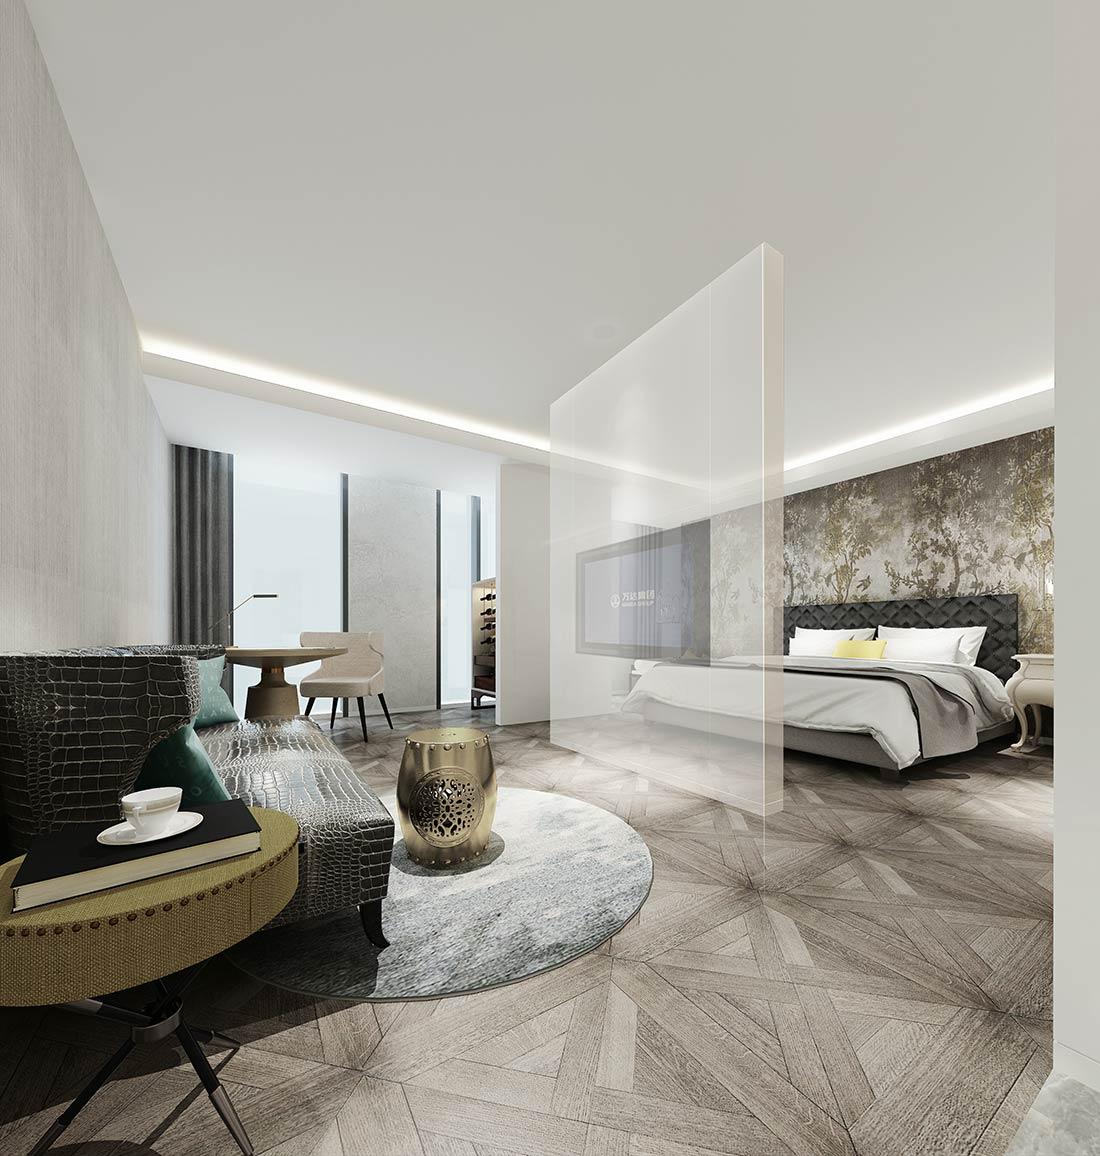 wanda-vista-residence-istanbul-for-sale-real-etate002